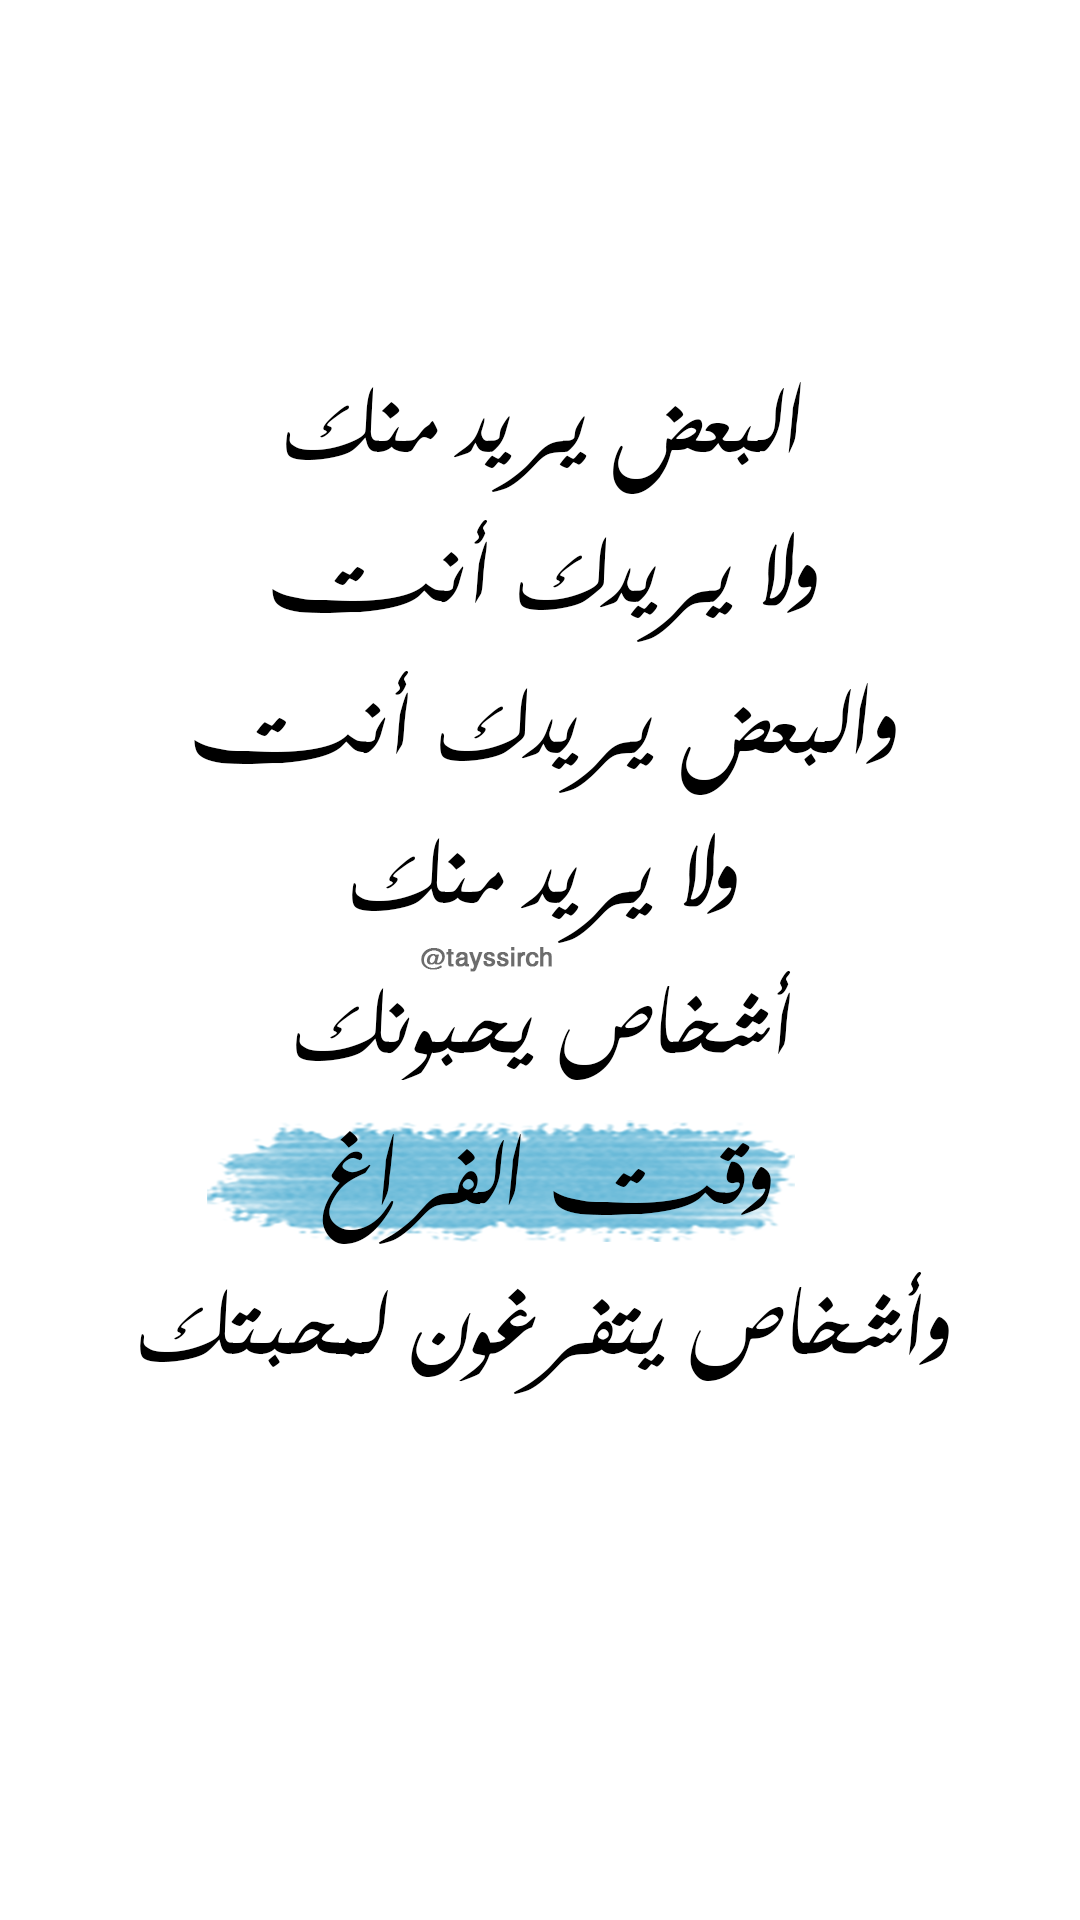 البعض يريد منك ولا يريدك أنت Funny Arabic Quotes Ali Quotes Words Quotes